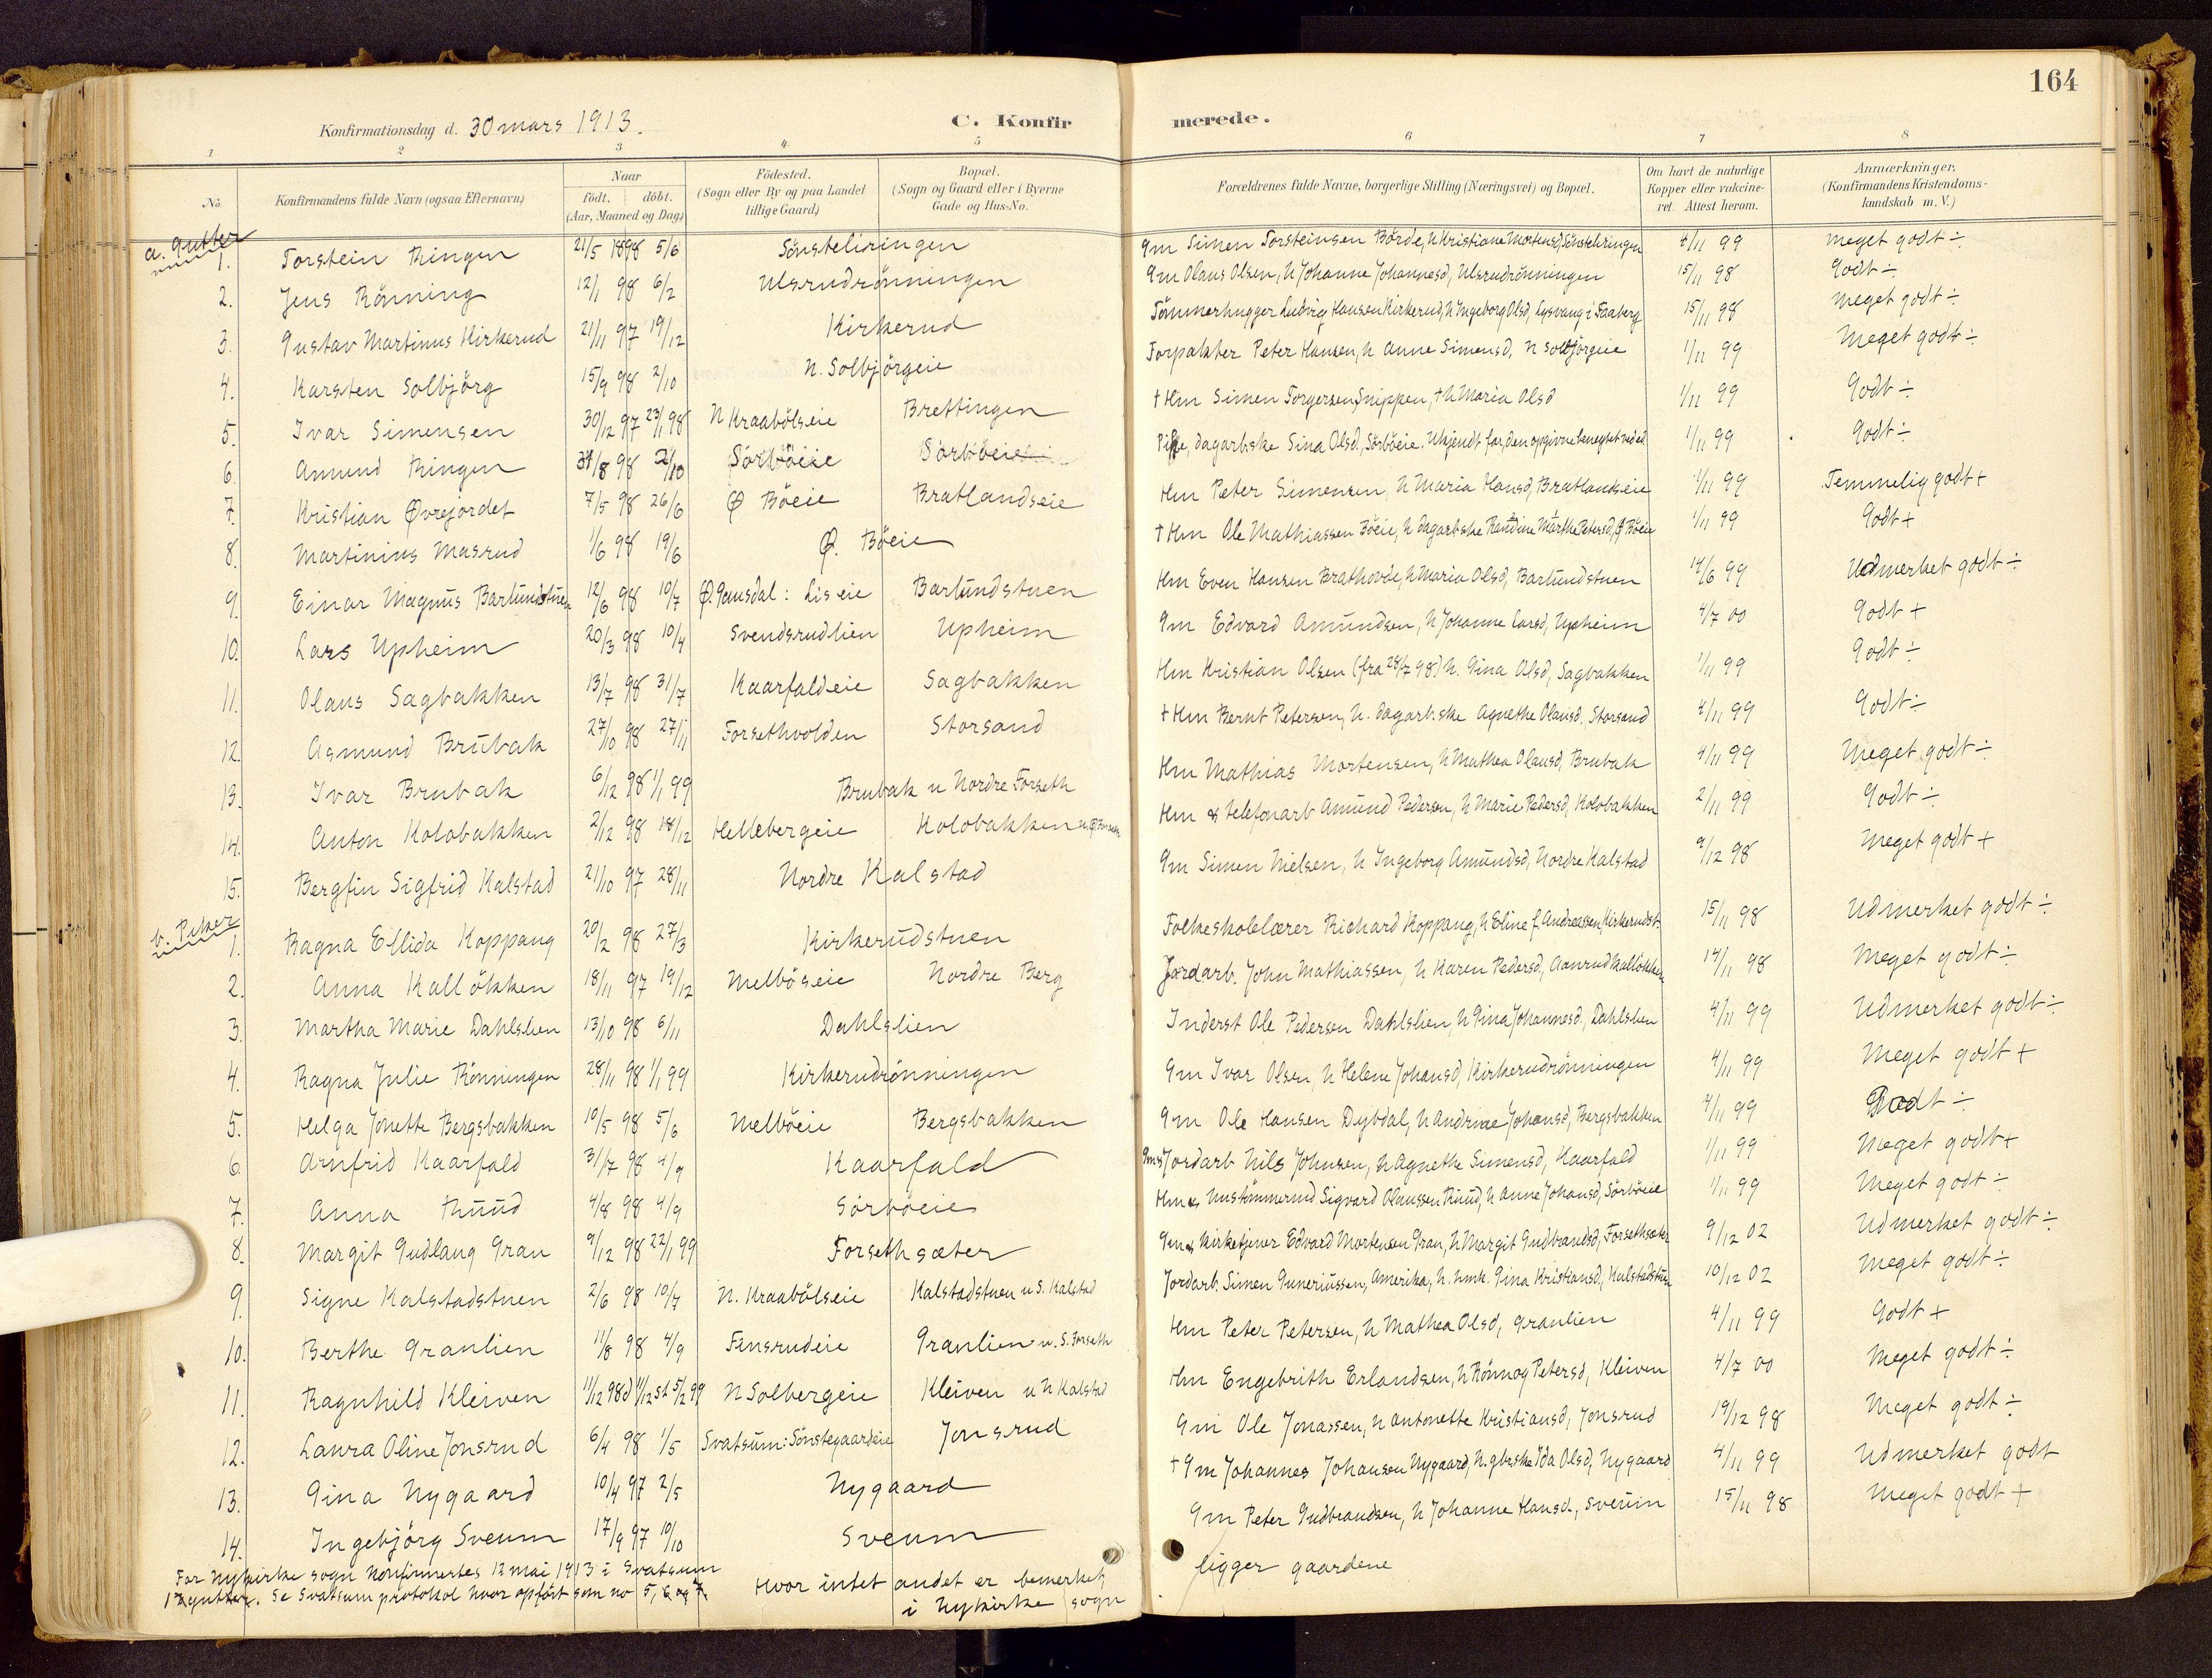 SAH, Vestre Gausdal prestekontor, Ministerialbok nr. 1, 1887-1914, s. 164